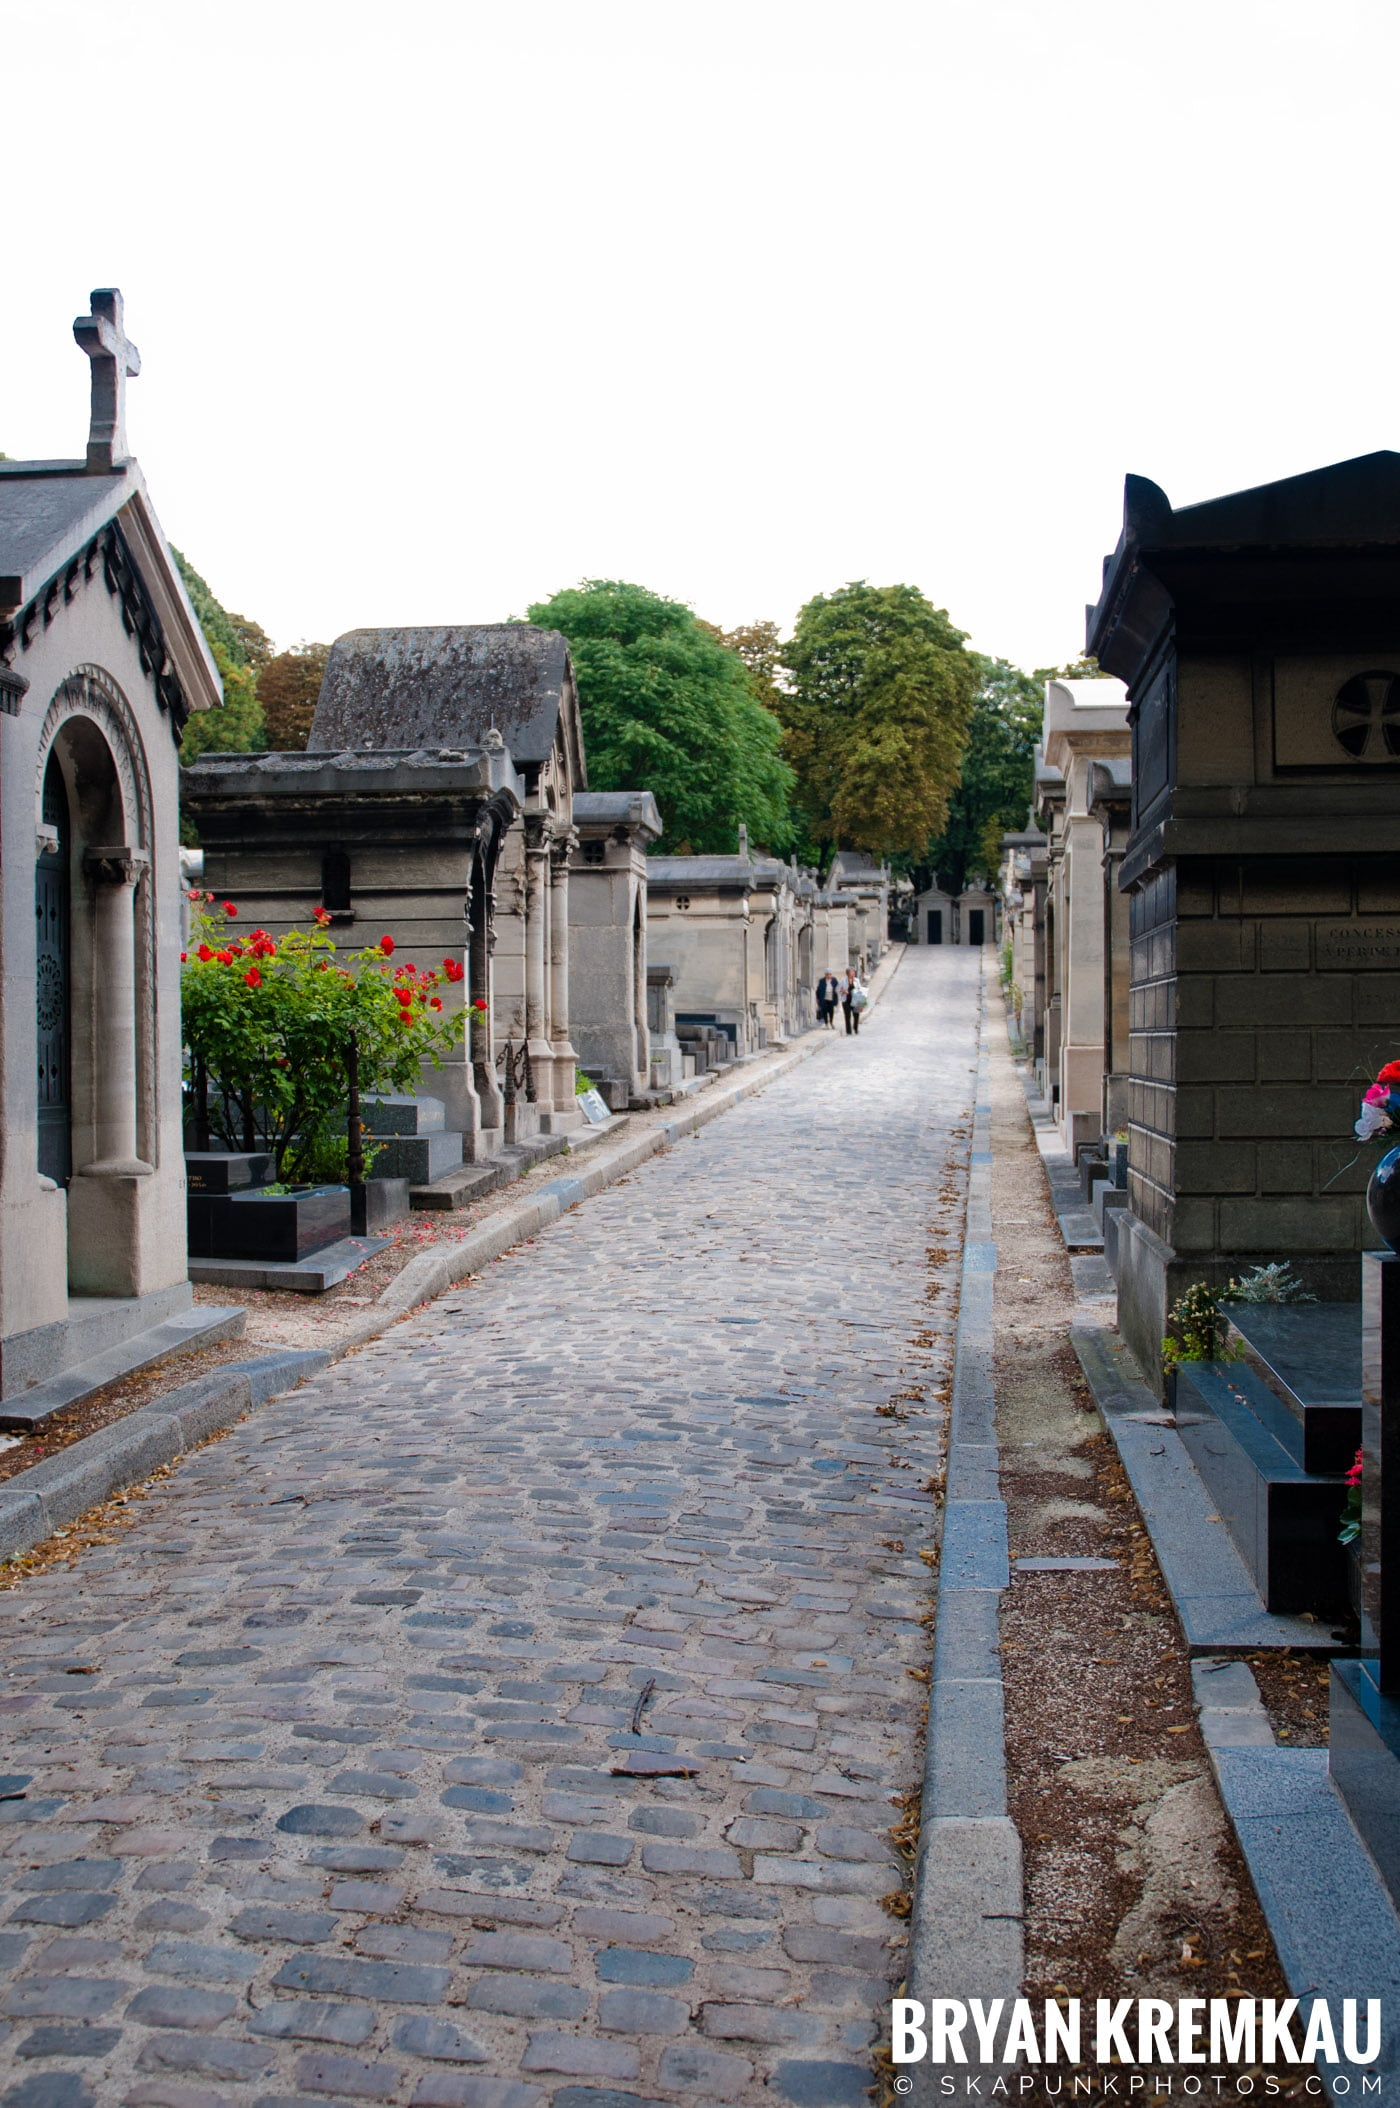 Paris, France Honeymoon - Day 5 - 7.22.11 (36)